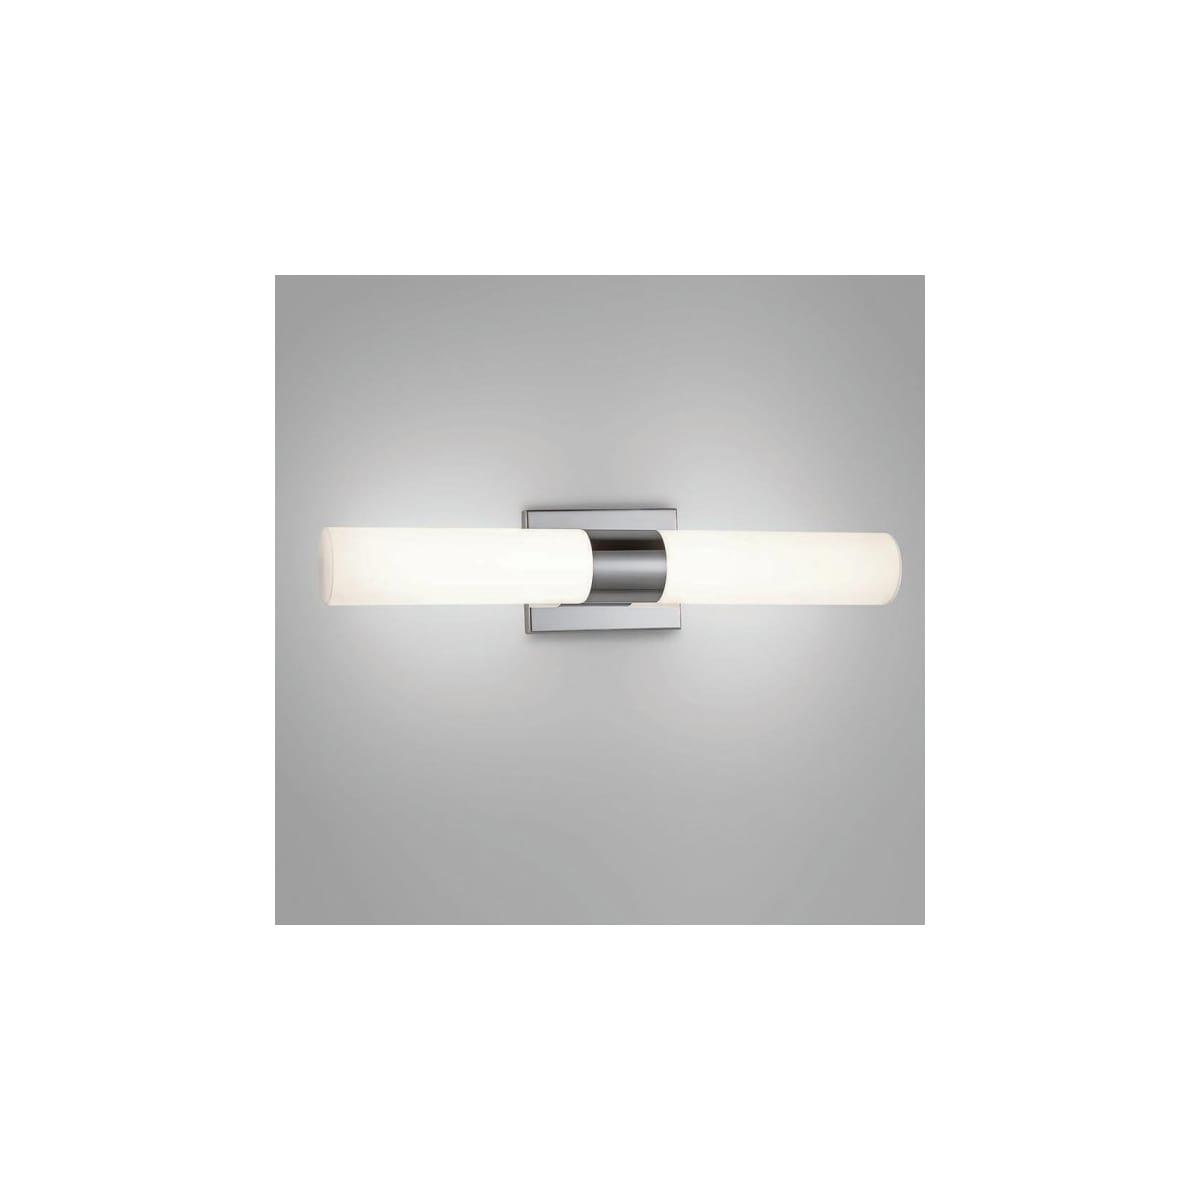 Wac Lighting Ws 7222f Bn Brushed Nickel Elemental 22 Led